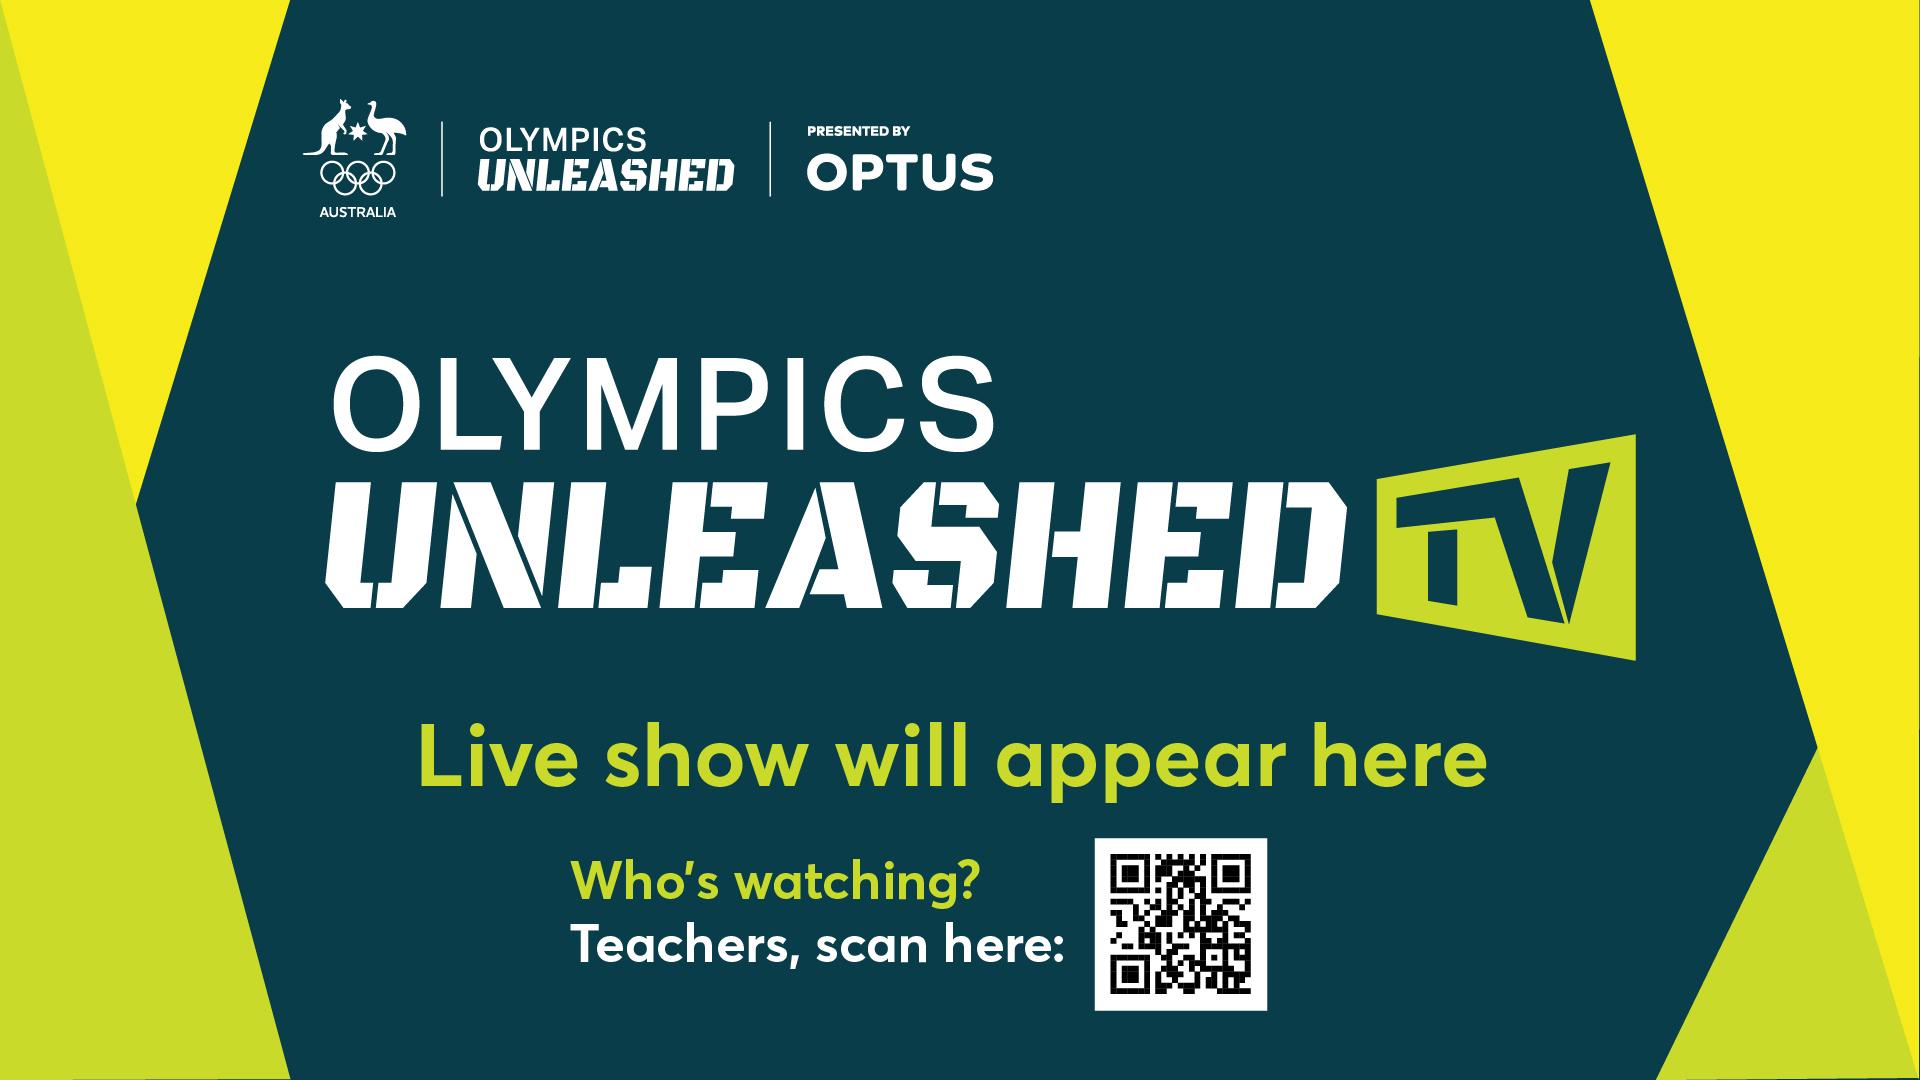 Olympics Unleashed TV